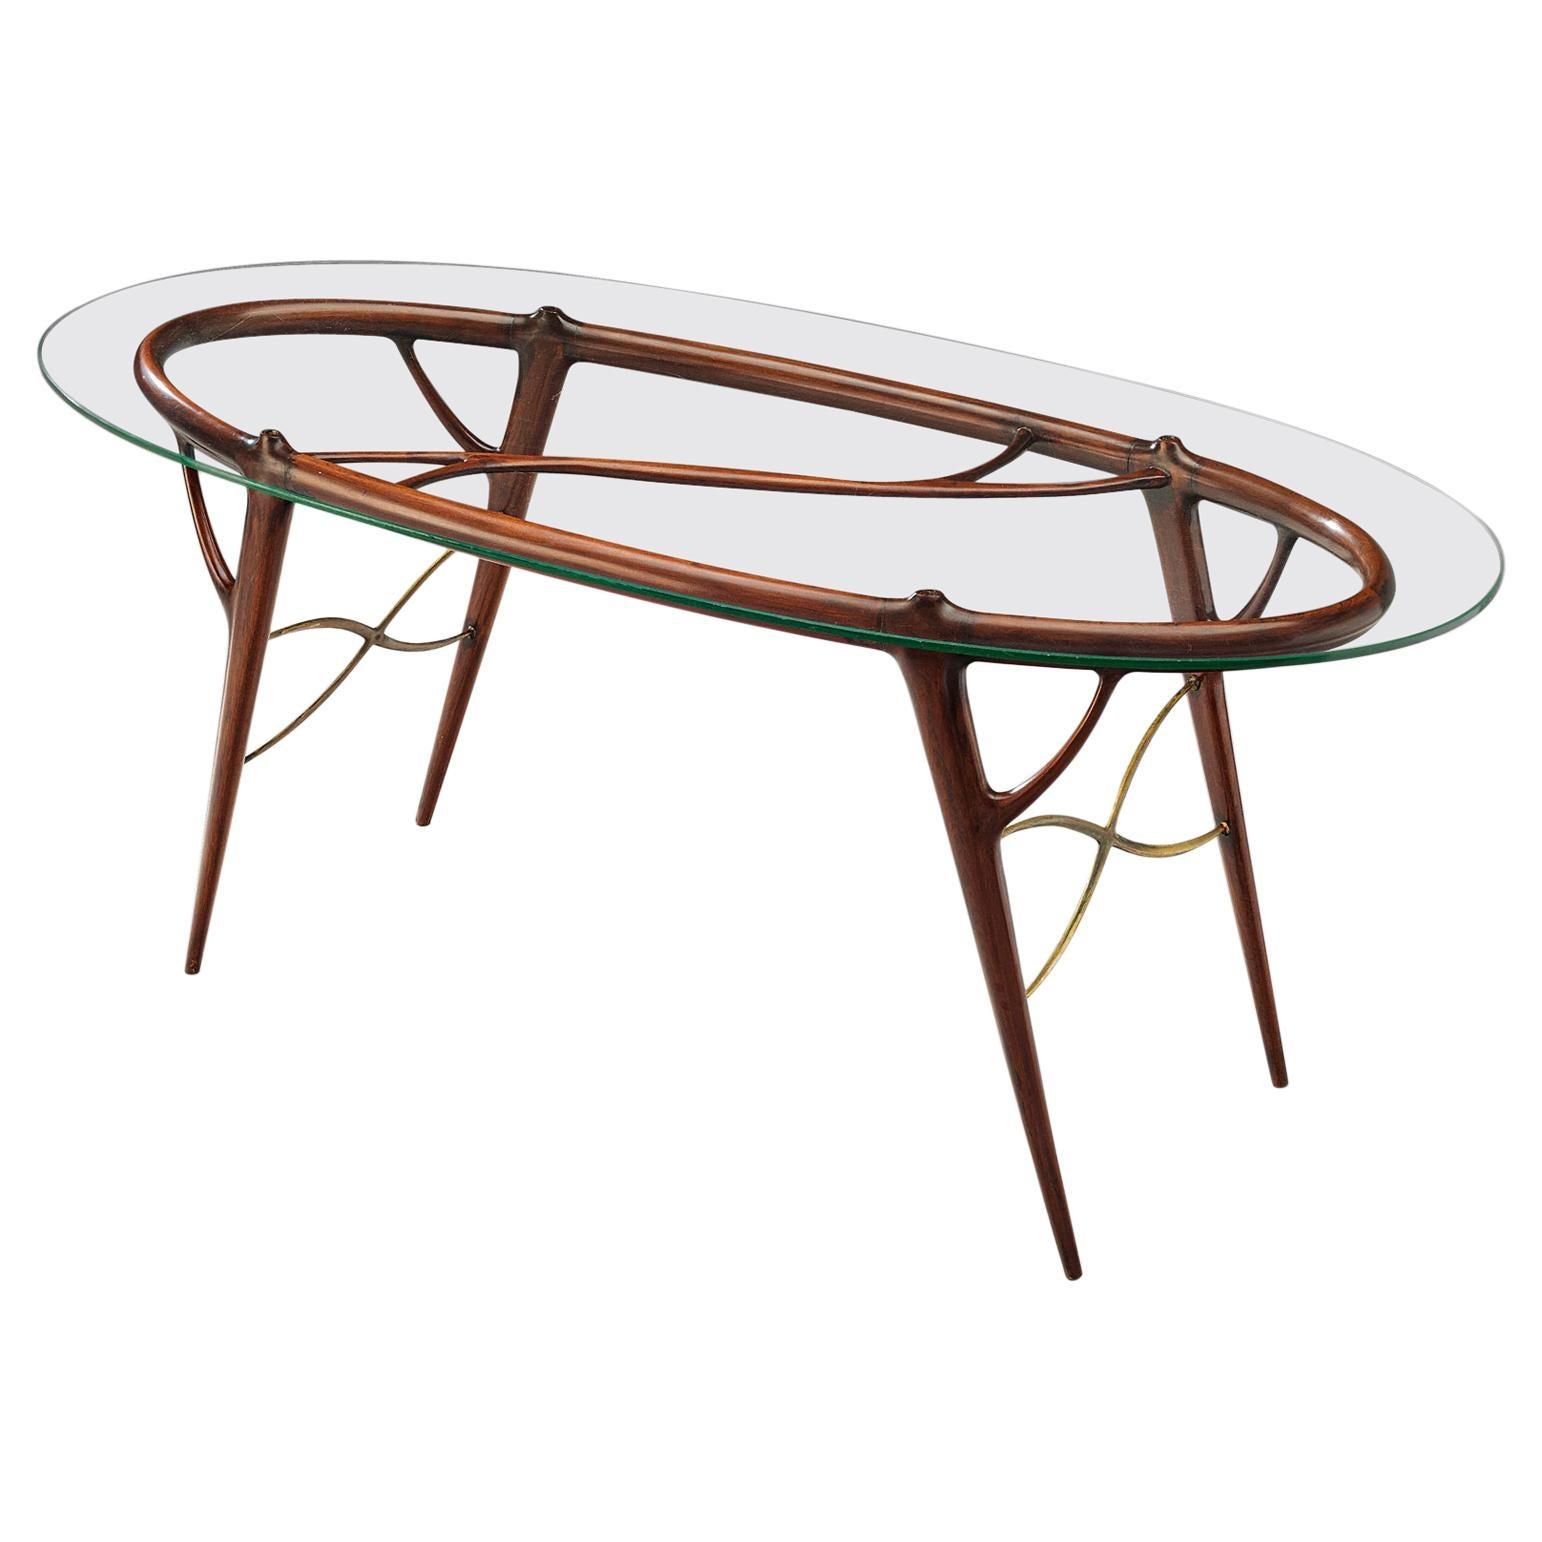 Silvio Cavatorta Sculptural Table in Mahogany